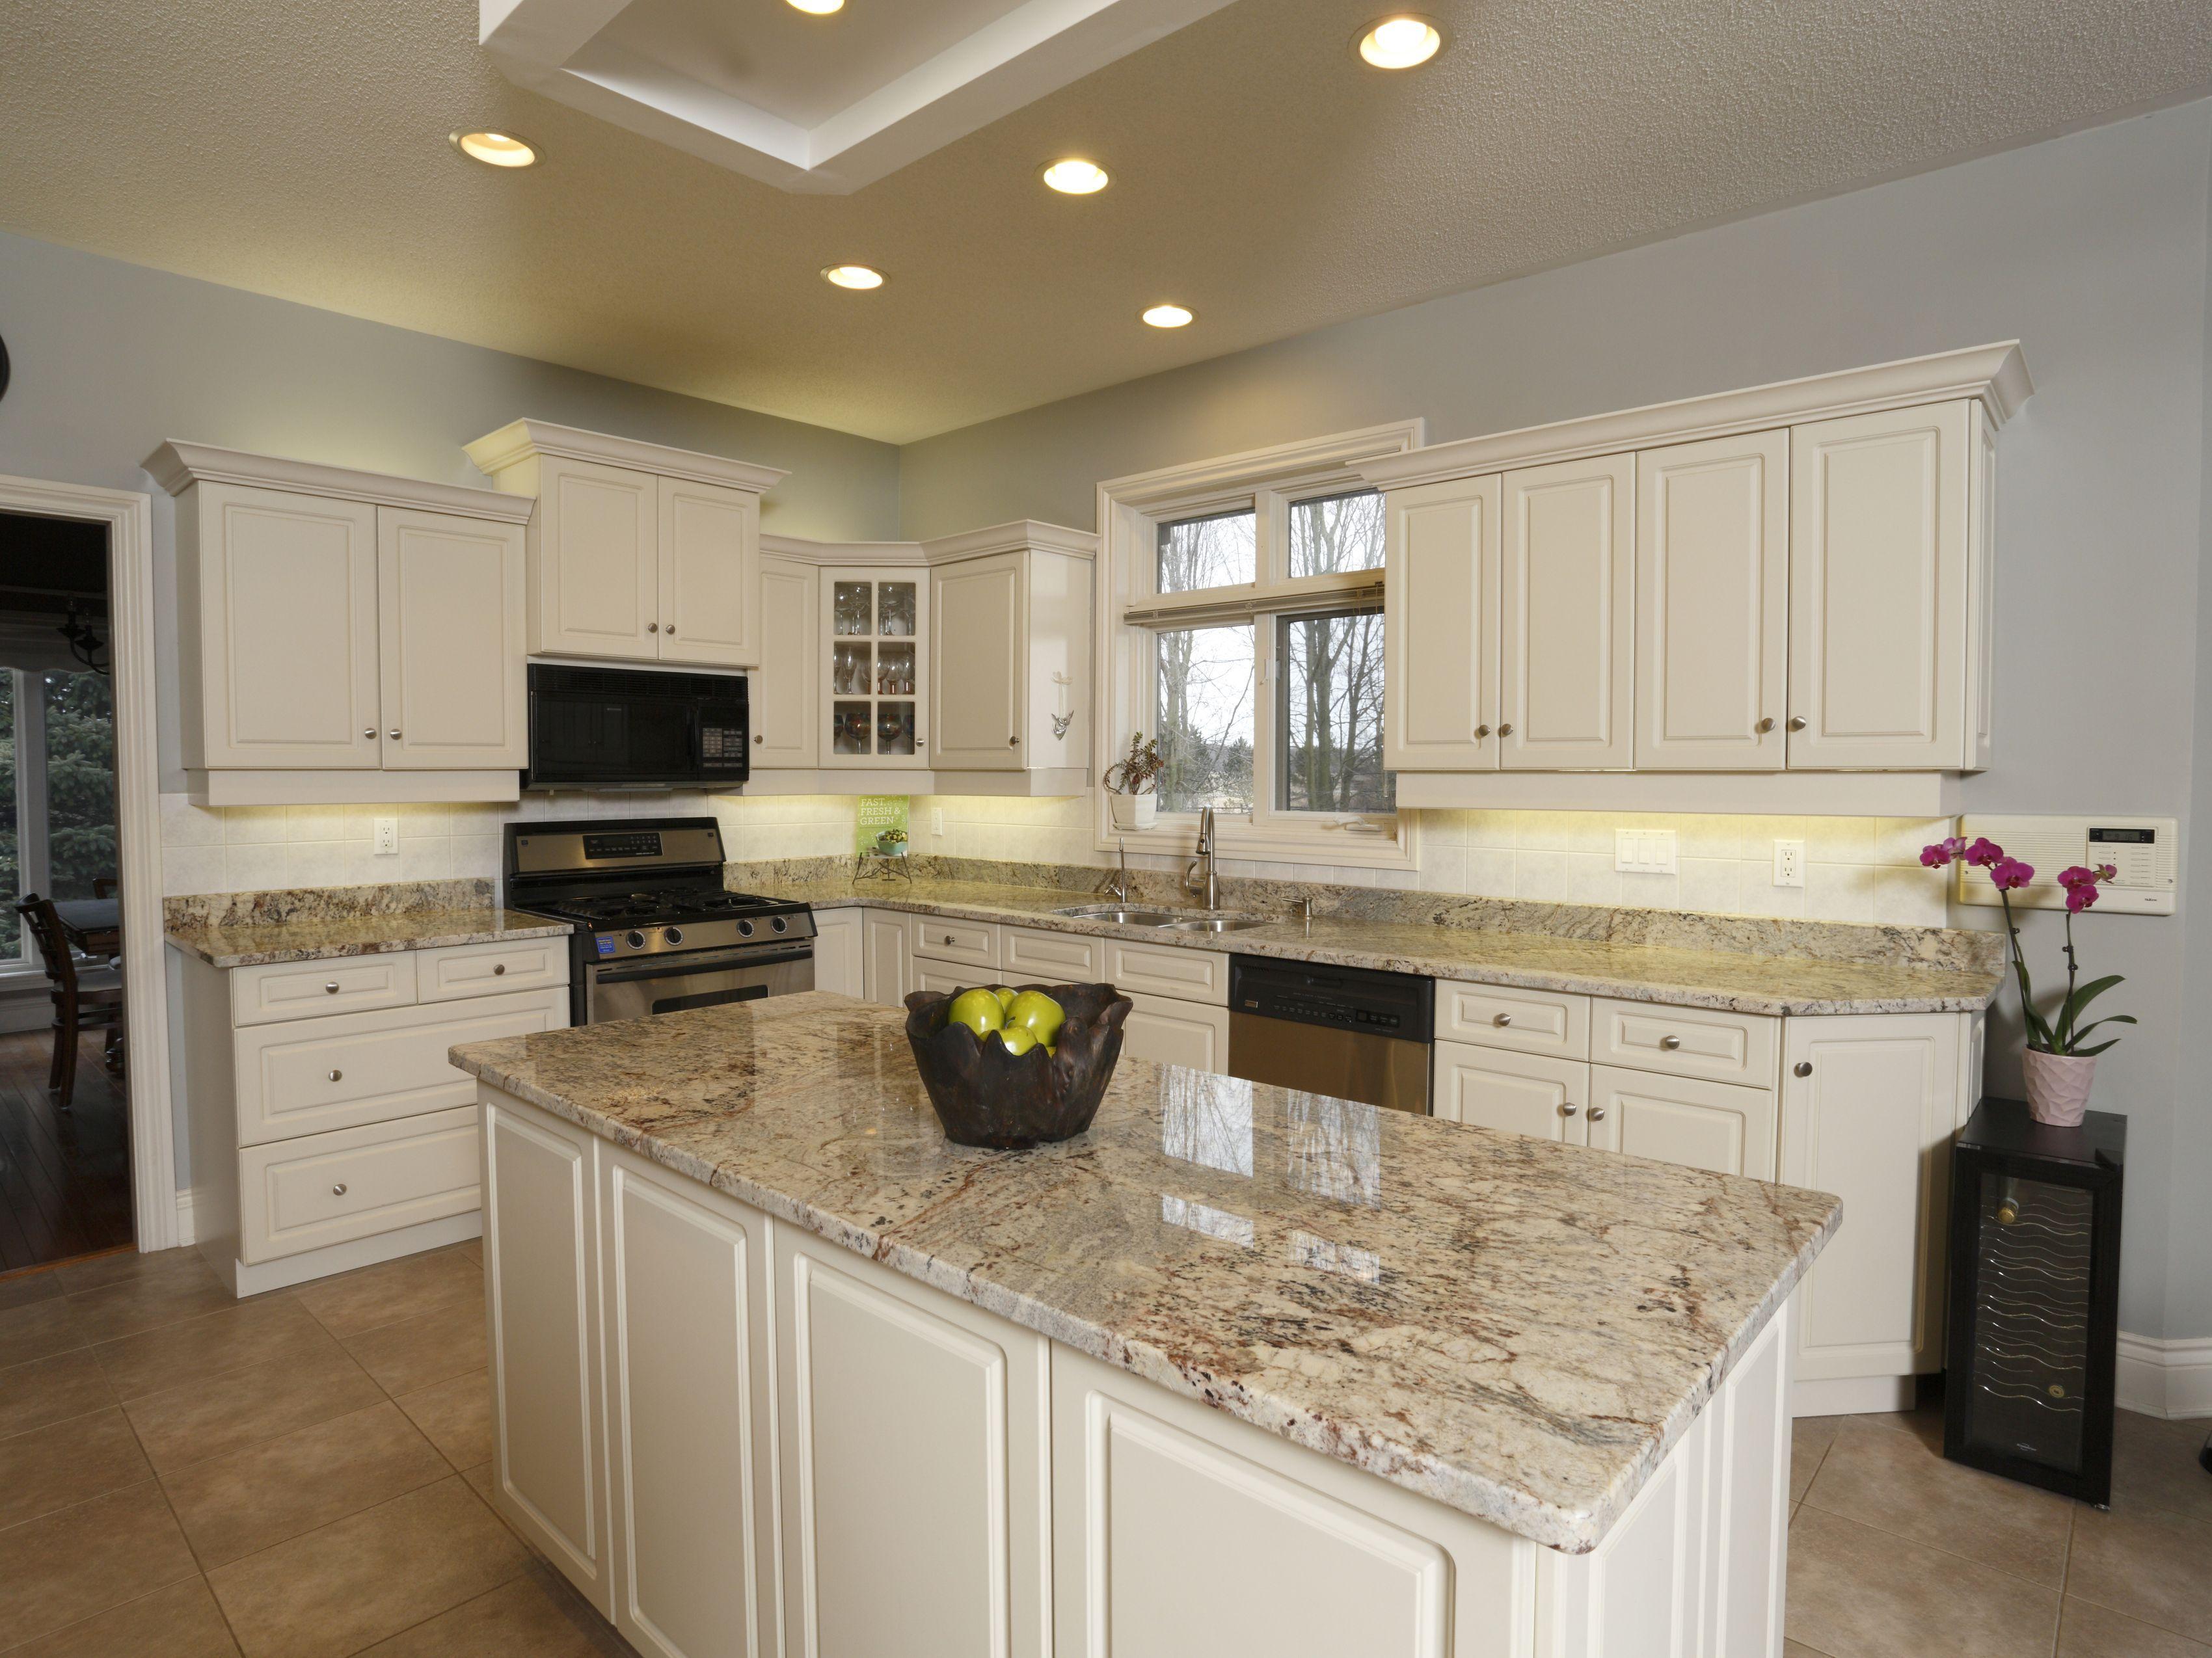 Exquisite Home Design With Sienna Bordeaux Granite Fresh